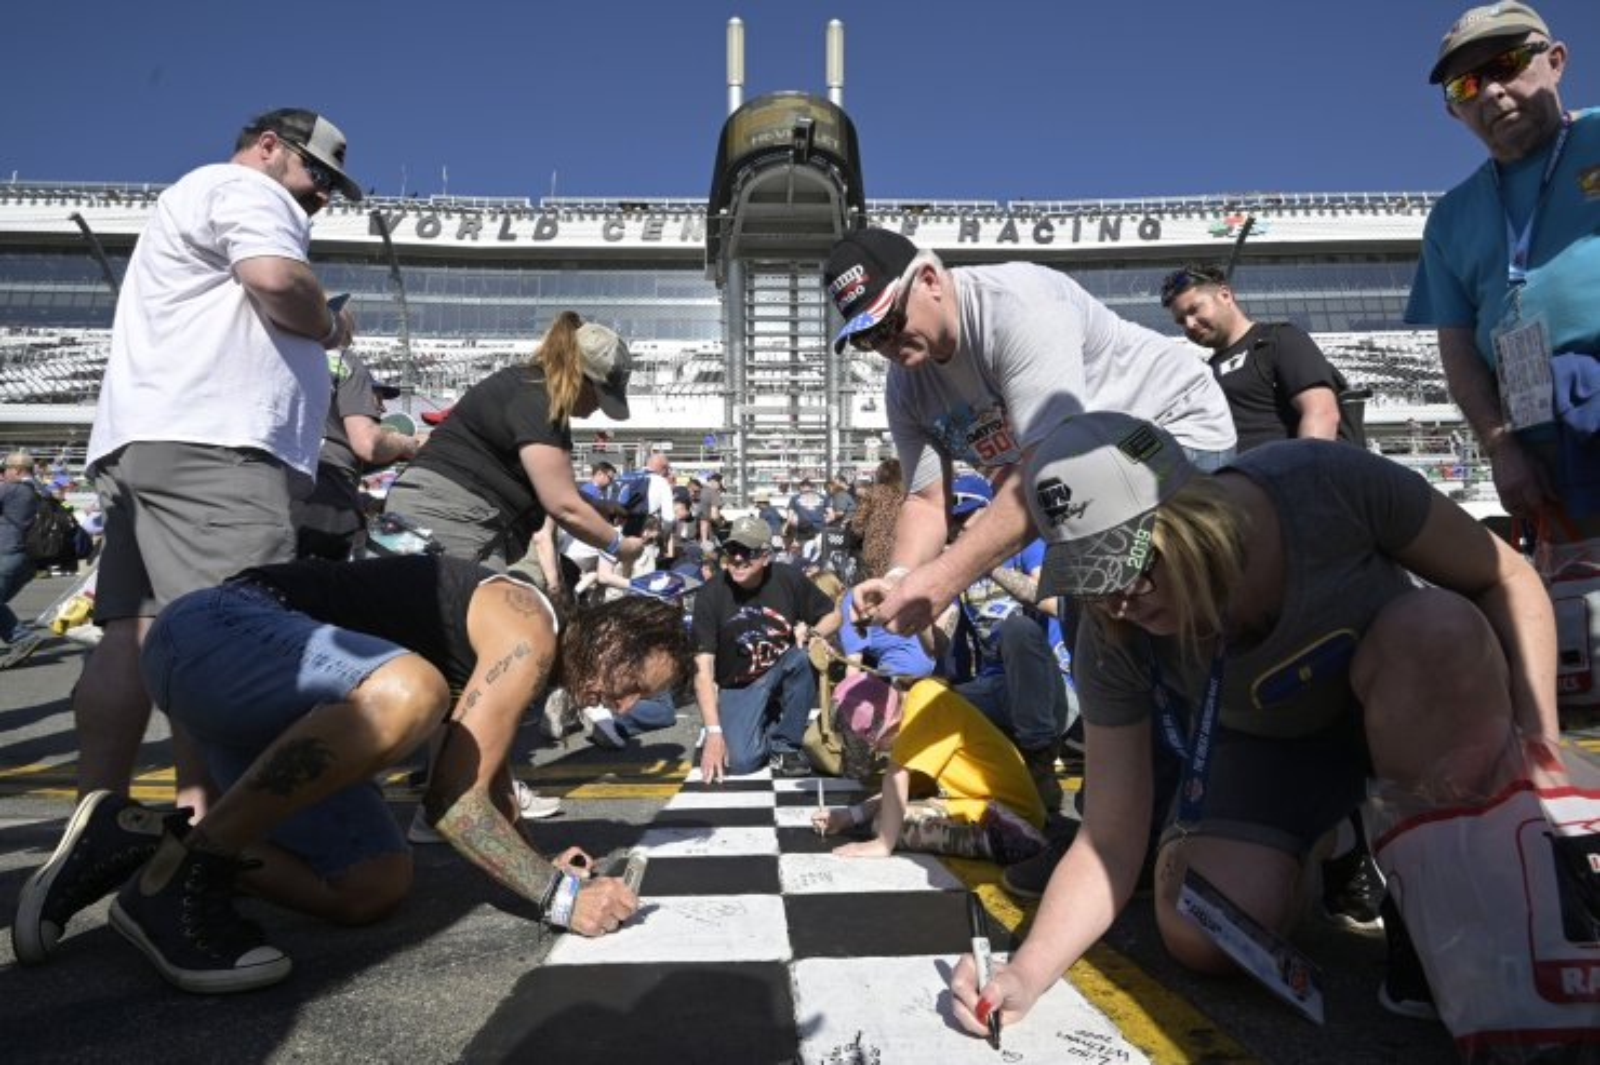 Fans leave their autographs on the start/finish line before the NASCAR Daytona 500 auto race at Daytona International Speedway, Sunday, Feb. 16, 2020, in Daytona Beach, Fla. AP